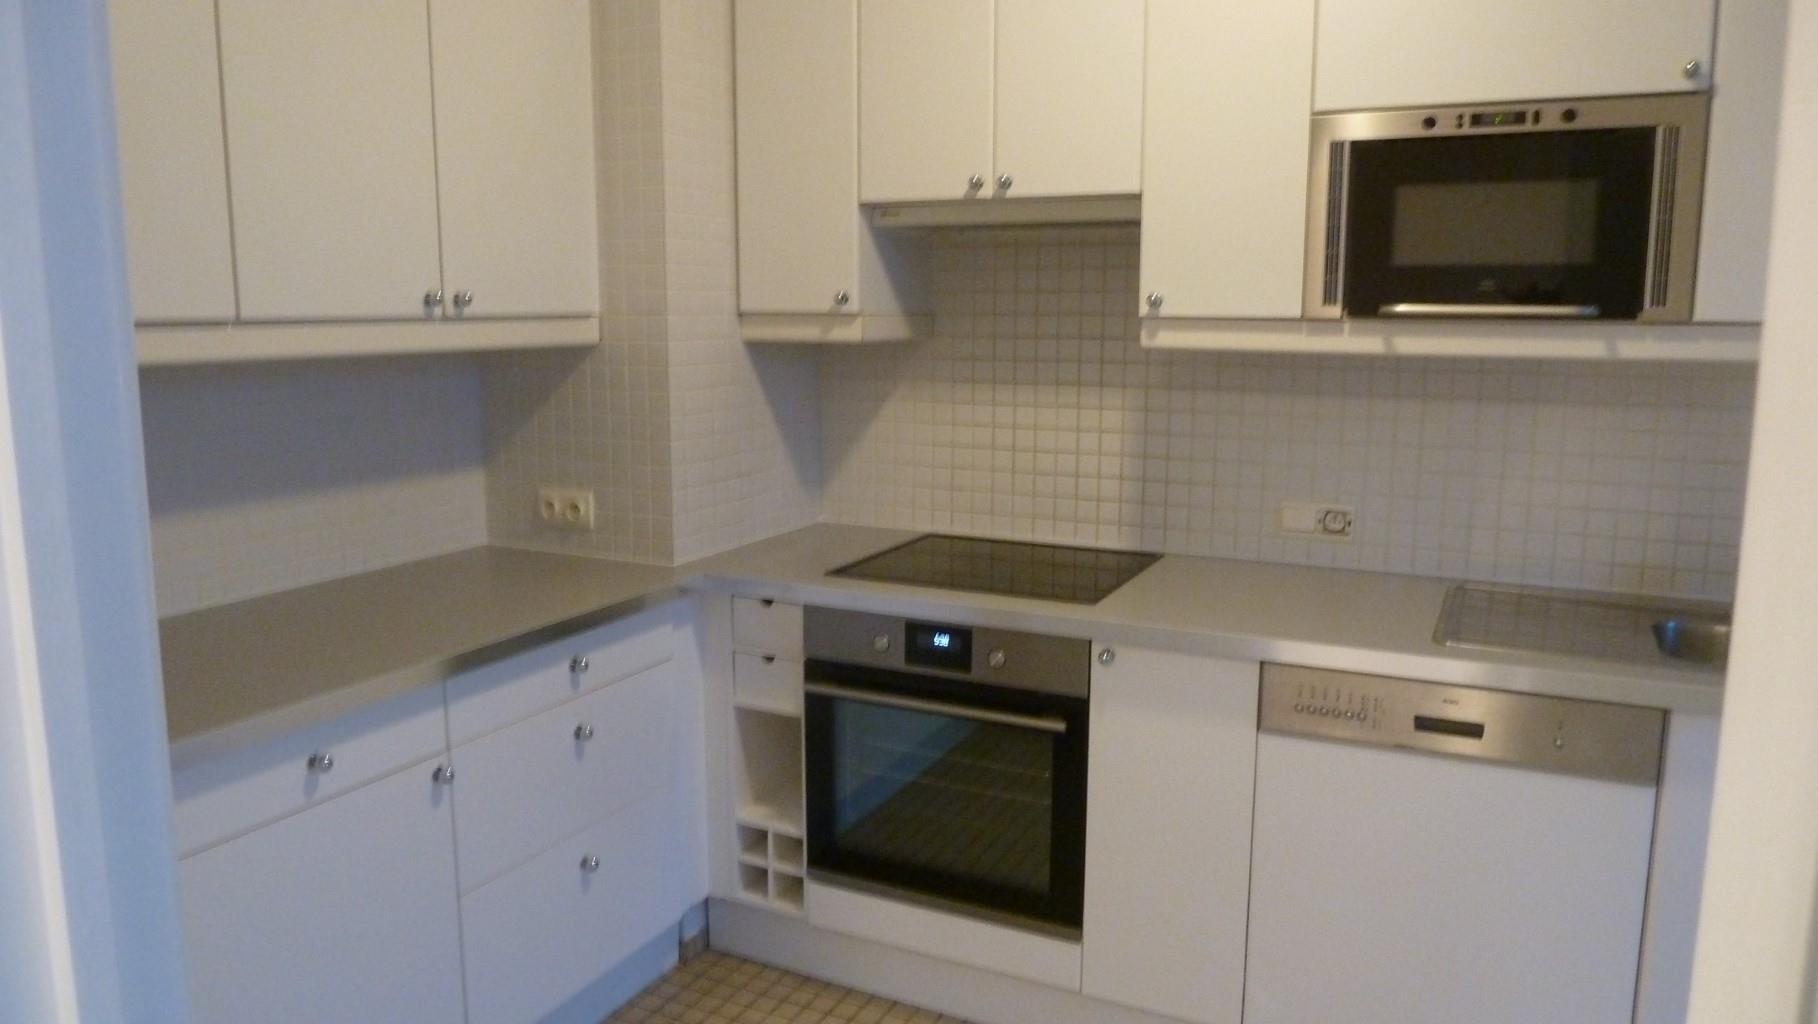 Appartement - Zaventem Sint-Stevens-Woluwe - #3970084-2